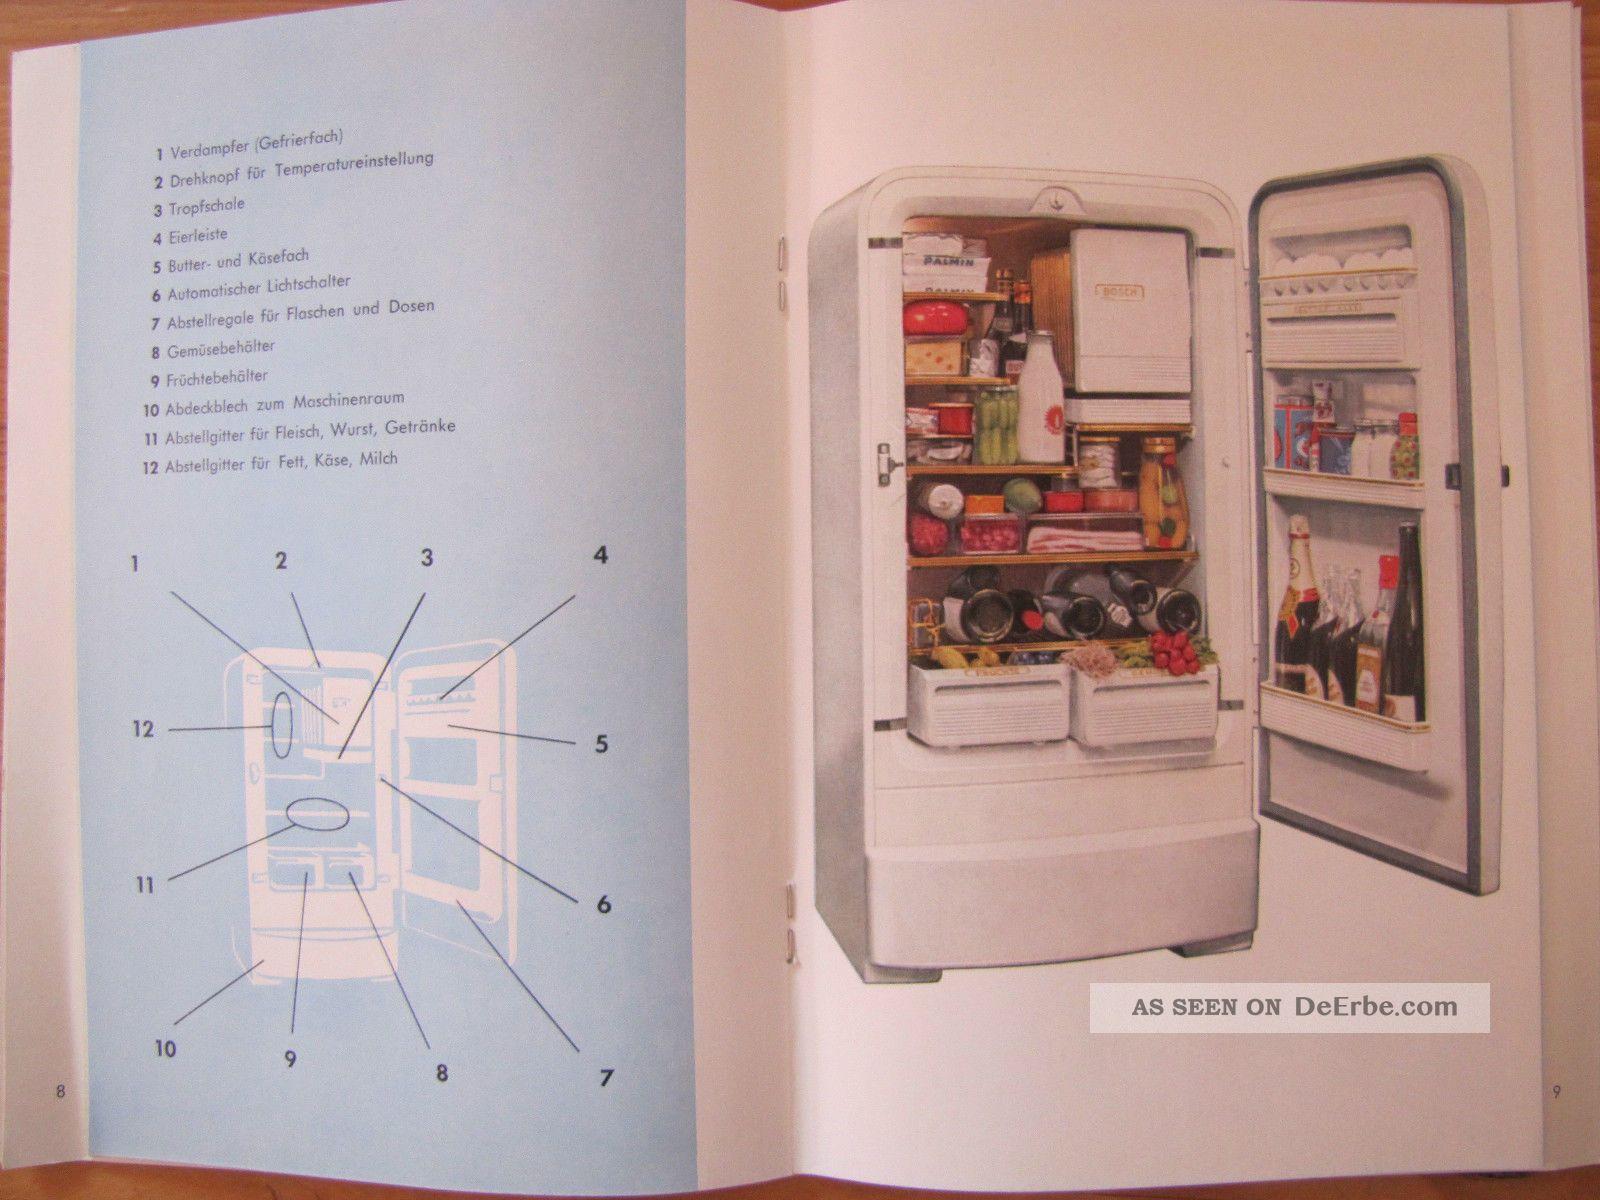 Siemens Kühlschrank Anleitung : Bosch mum küchenmaschine anleitung test eismaschine bosch